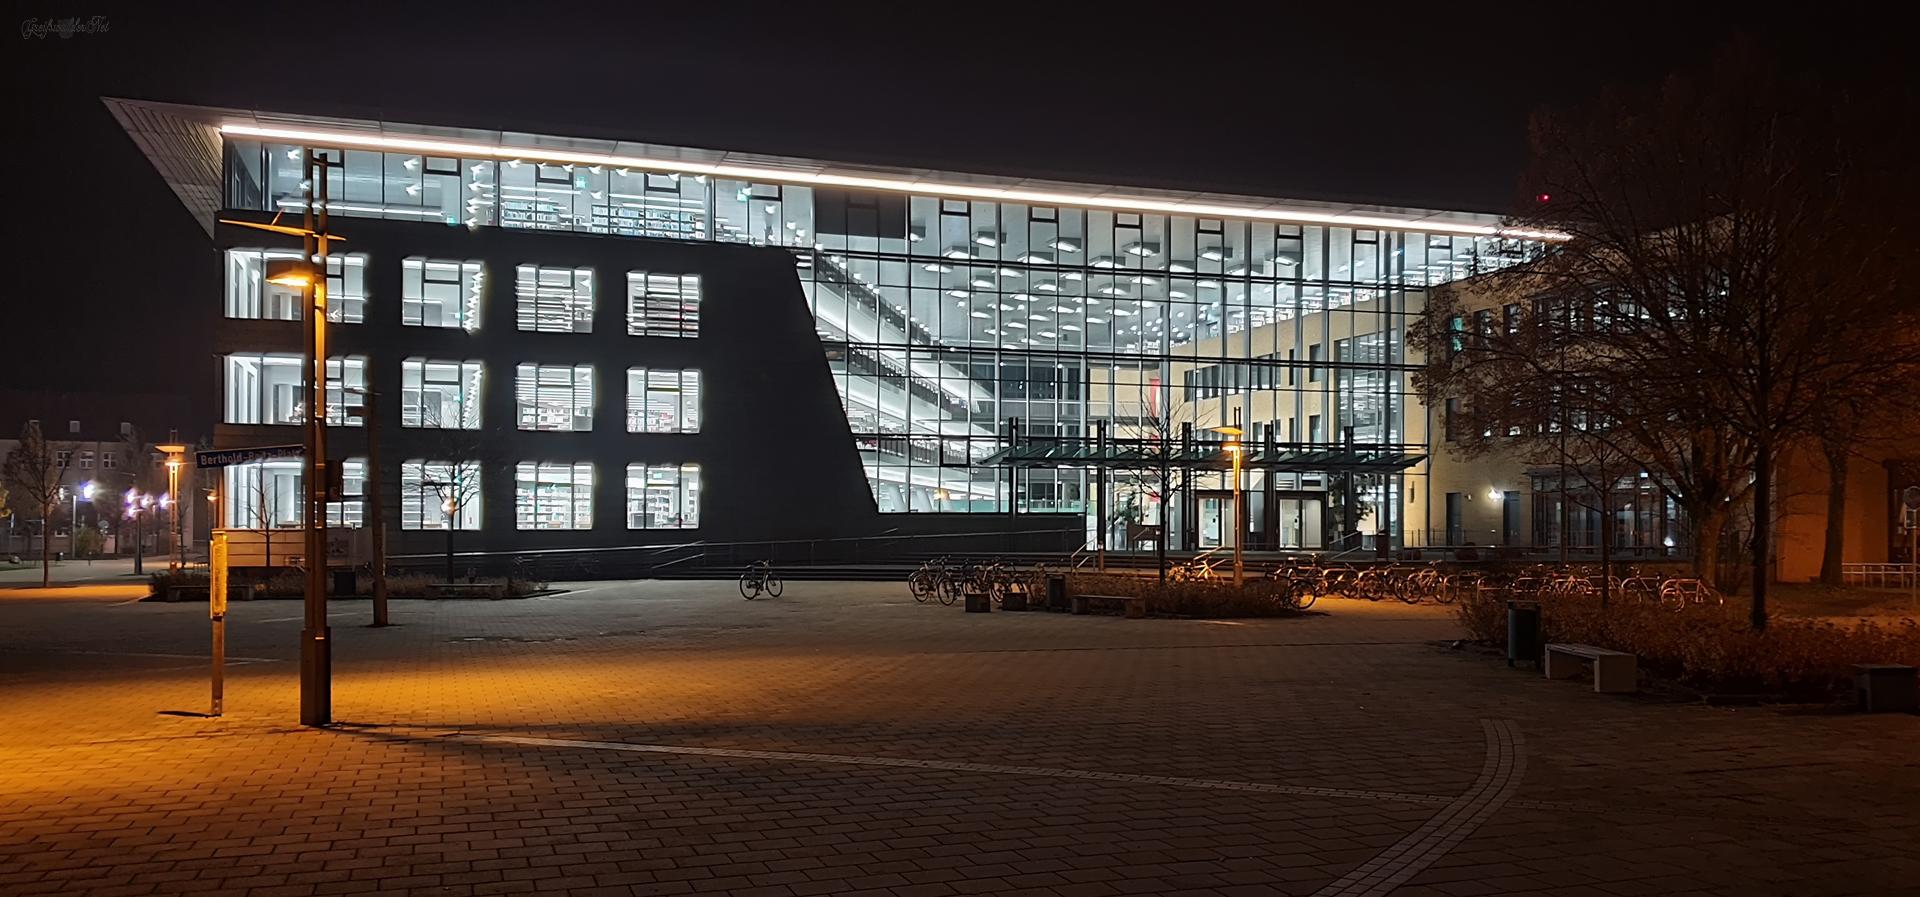 Universitätsbibliothek Greifswald